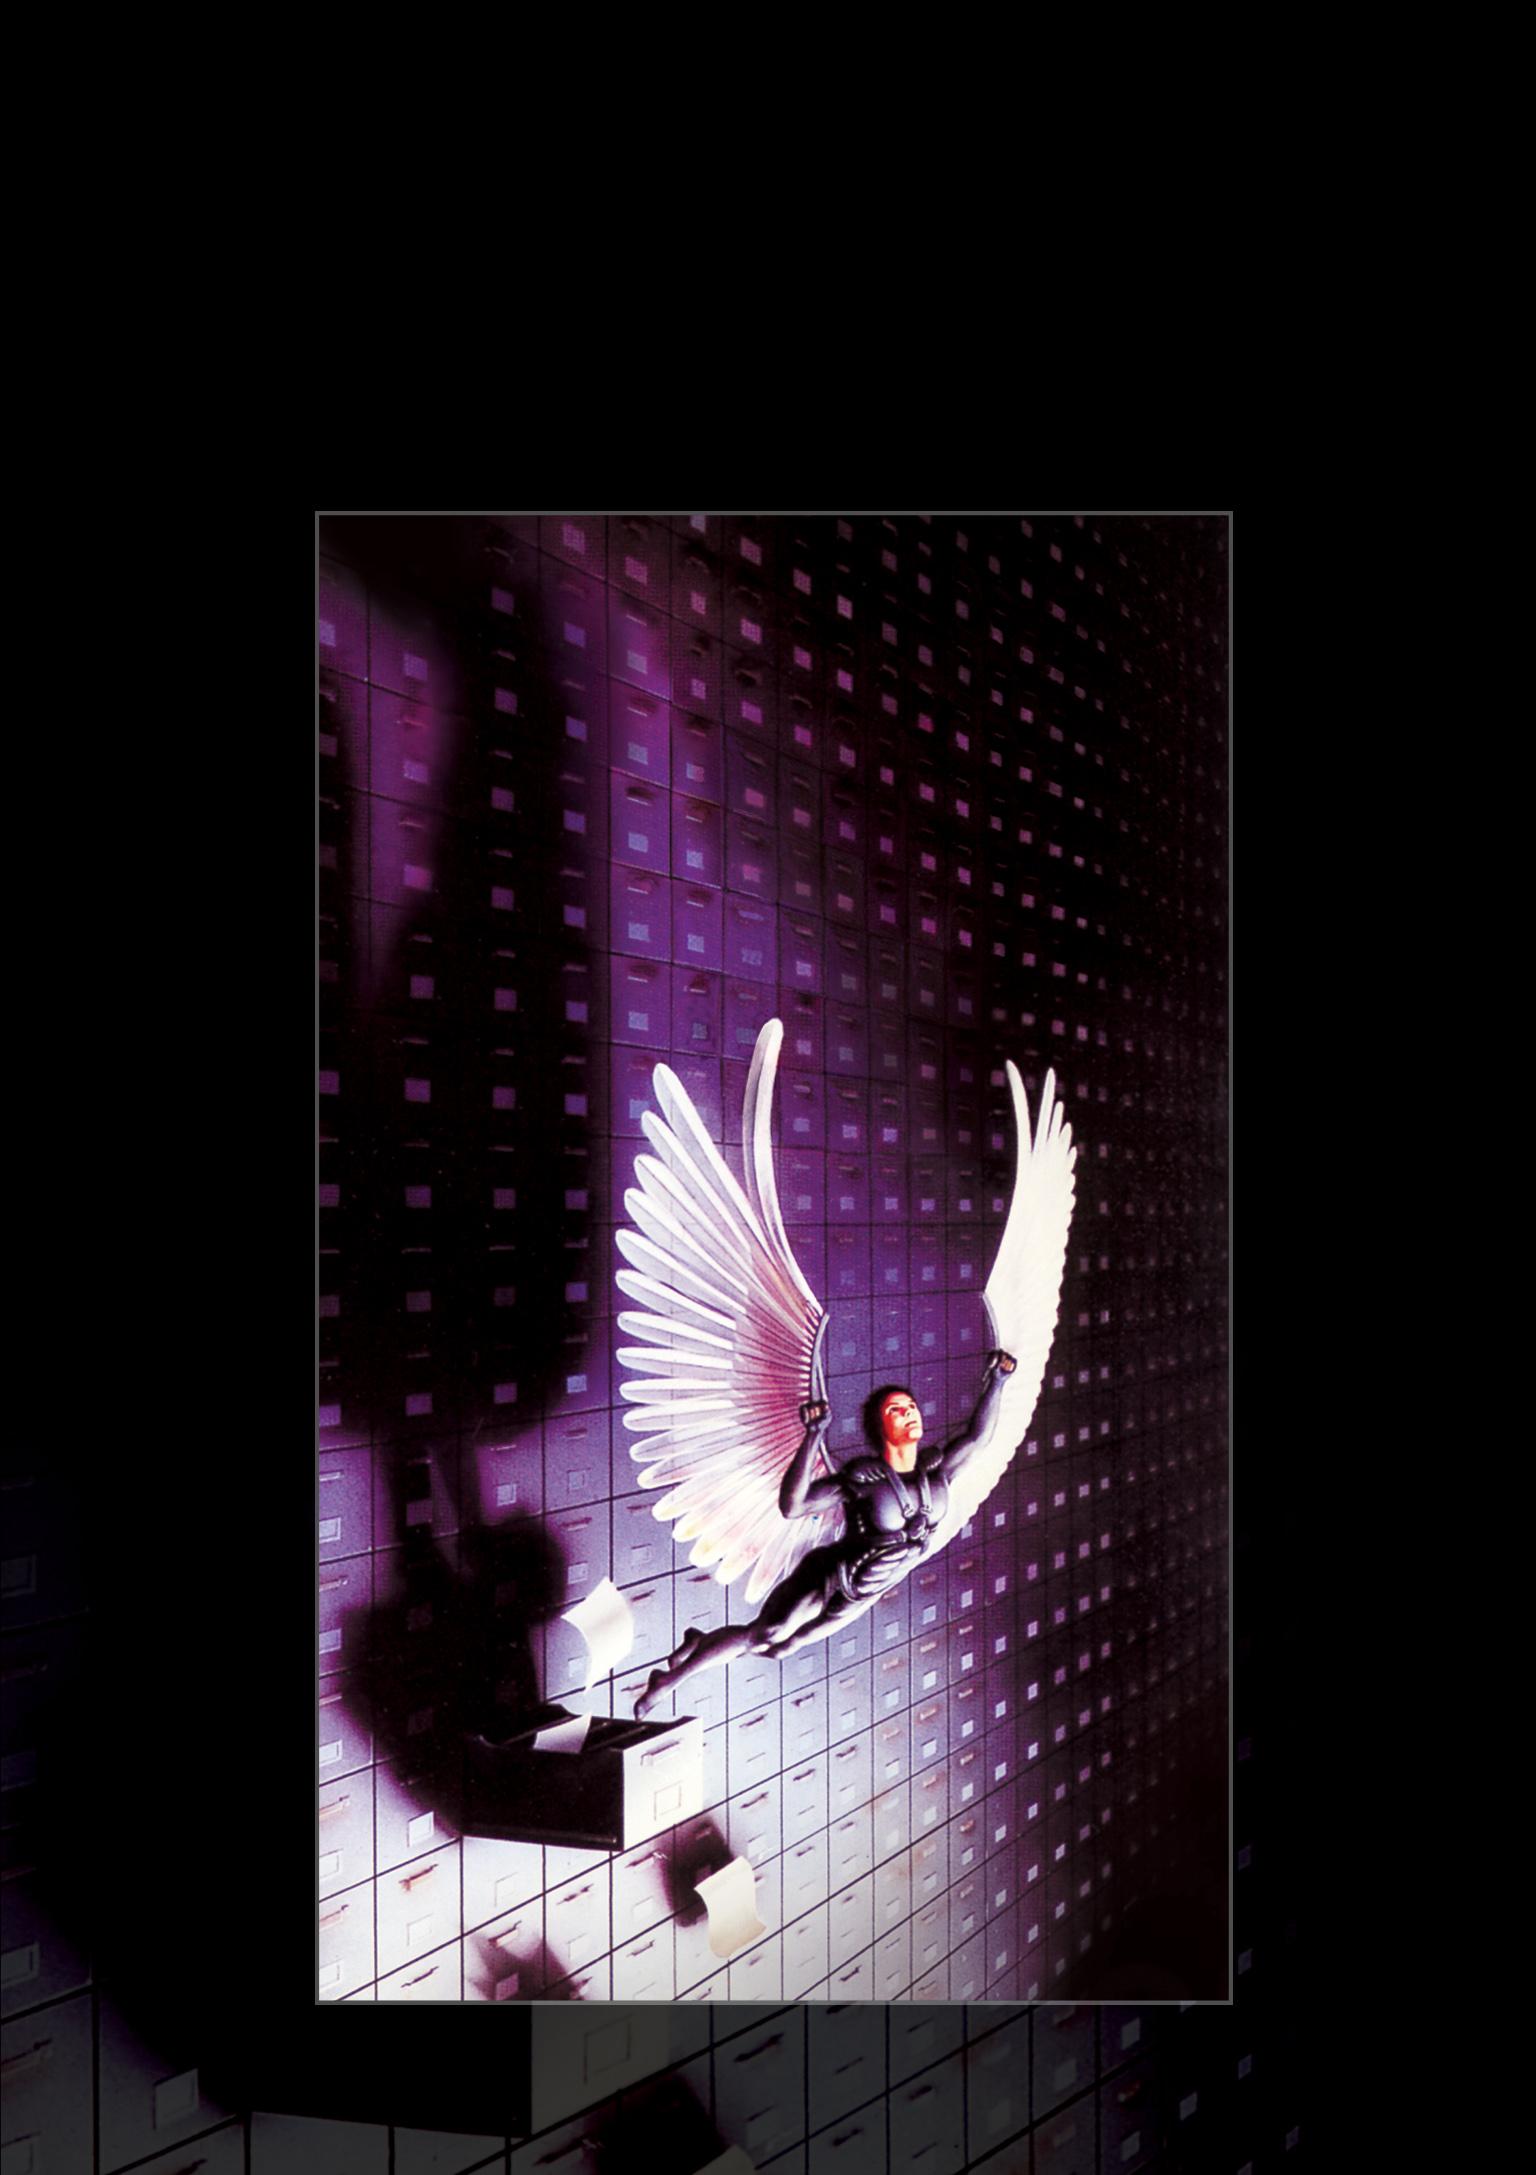 Brazil (1985) - Terry Gilliam